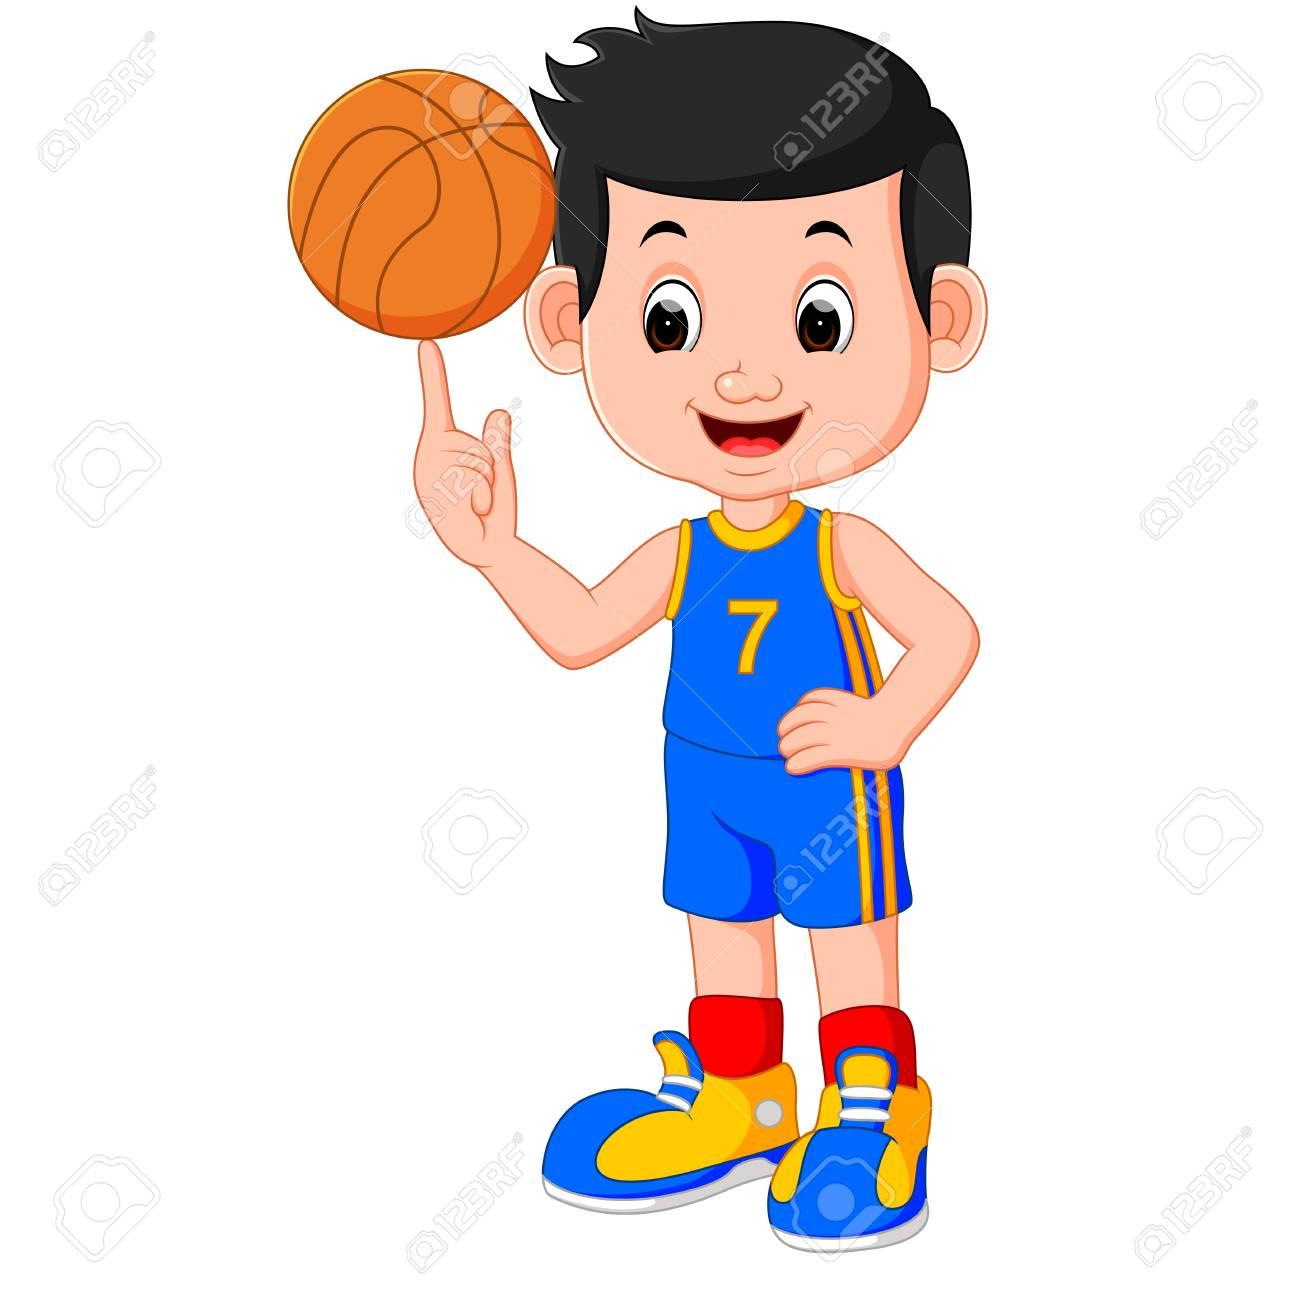 boy basketball player.